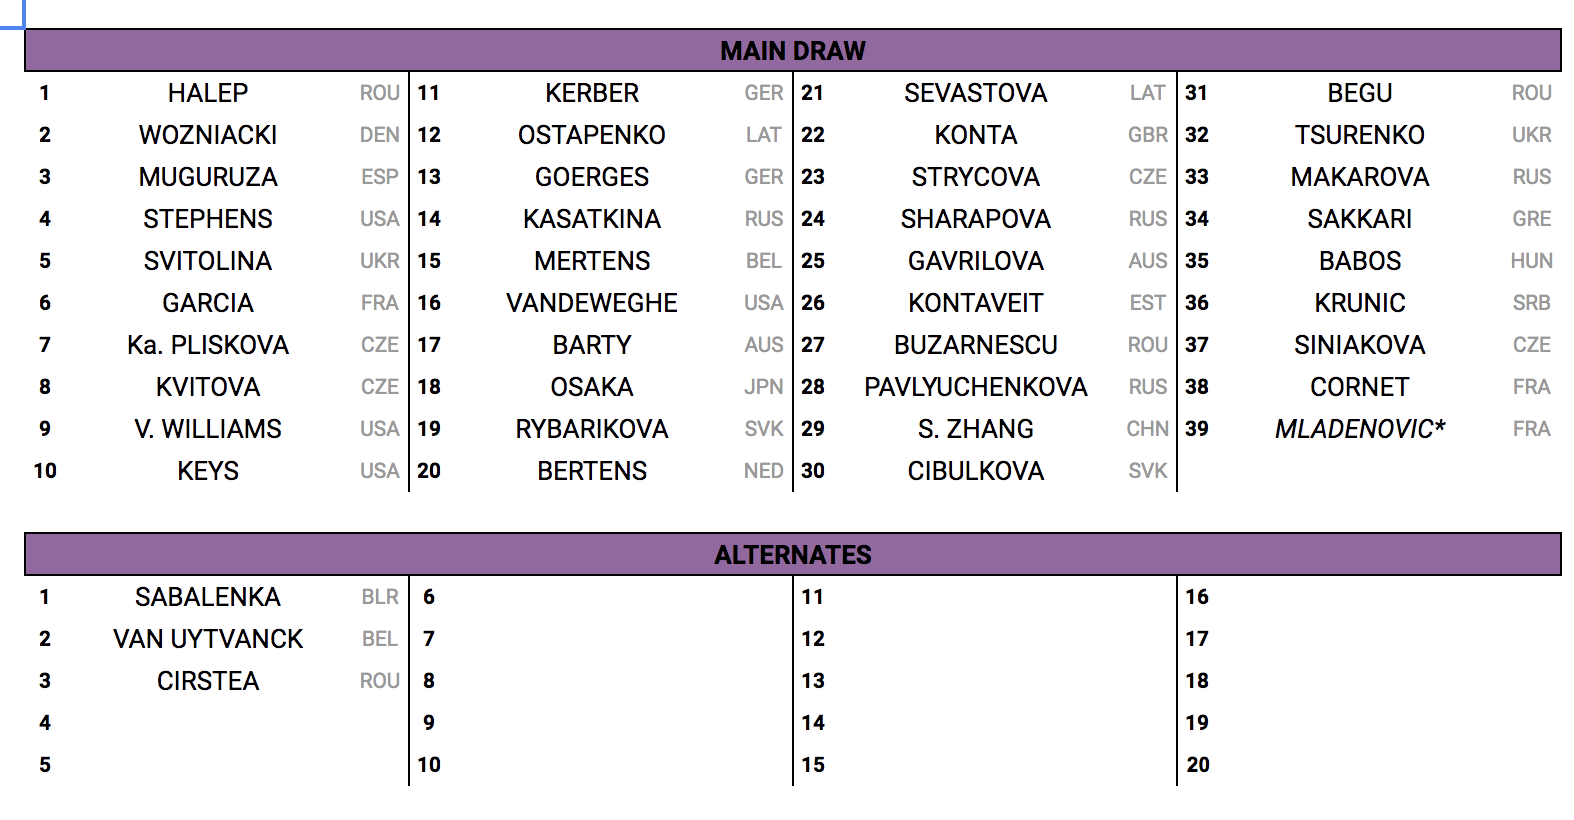 Rogers Cup WTA 2018 Main Draw